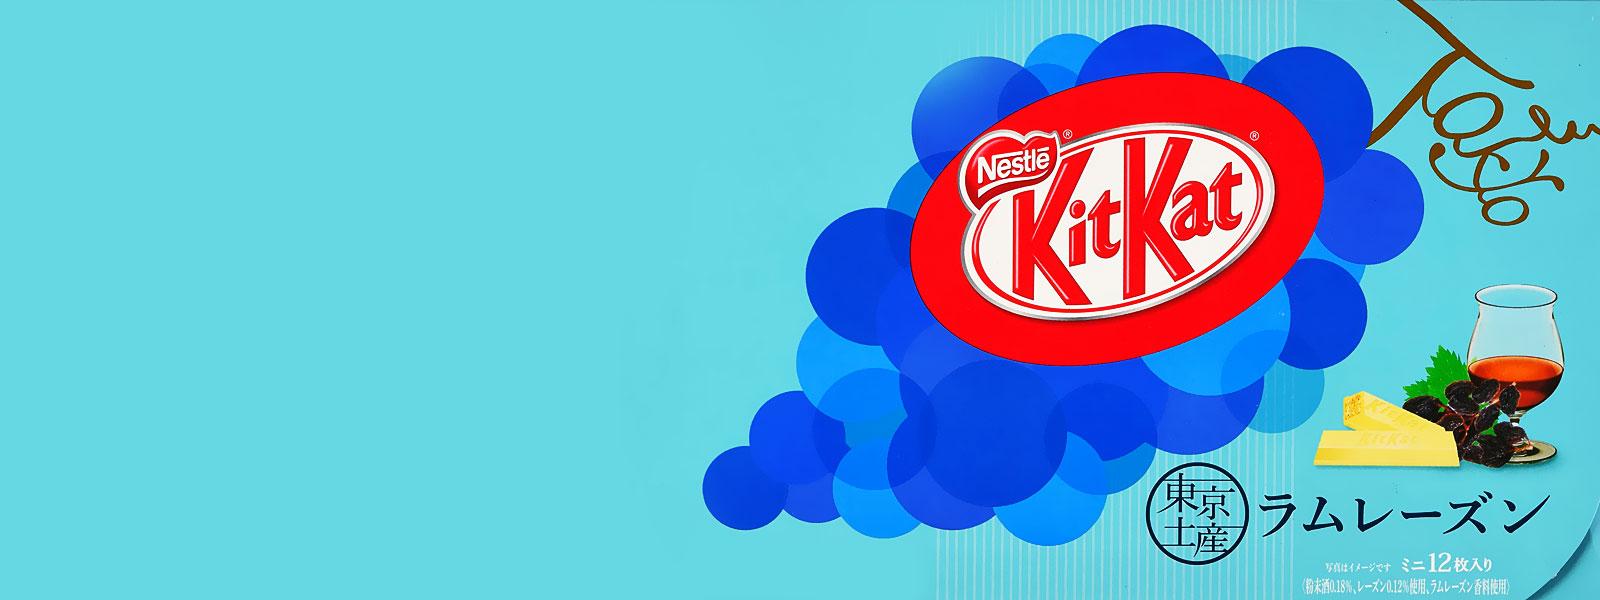 Top 5 Japanese KIT KAT Limited Flavors